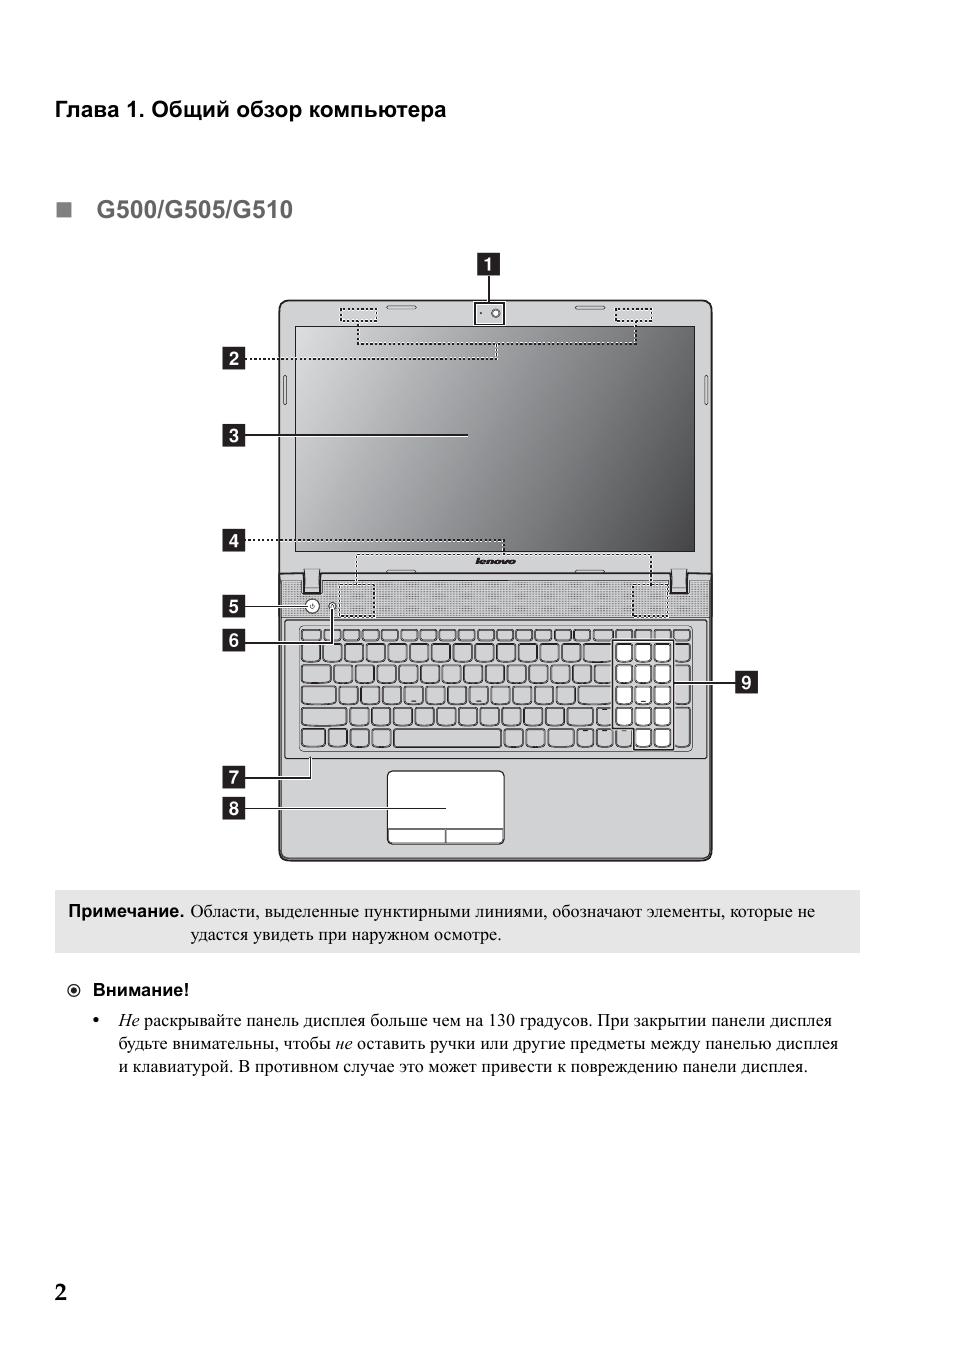 инструкция по эксплуатации ноутбука леново g505